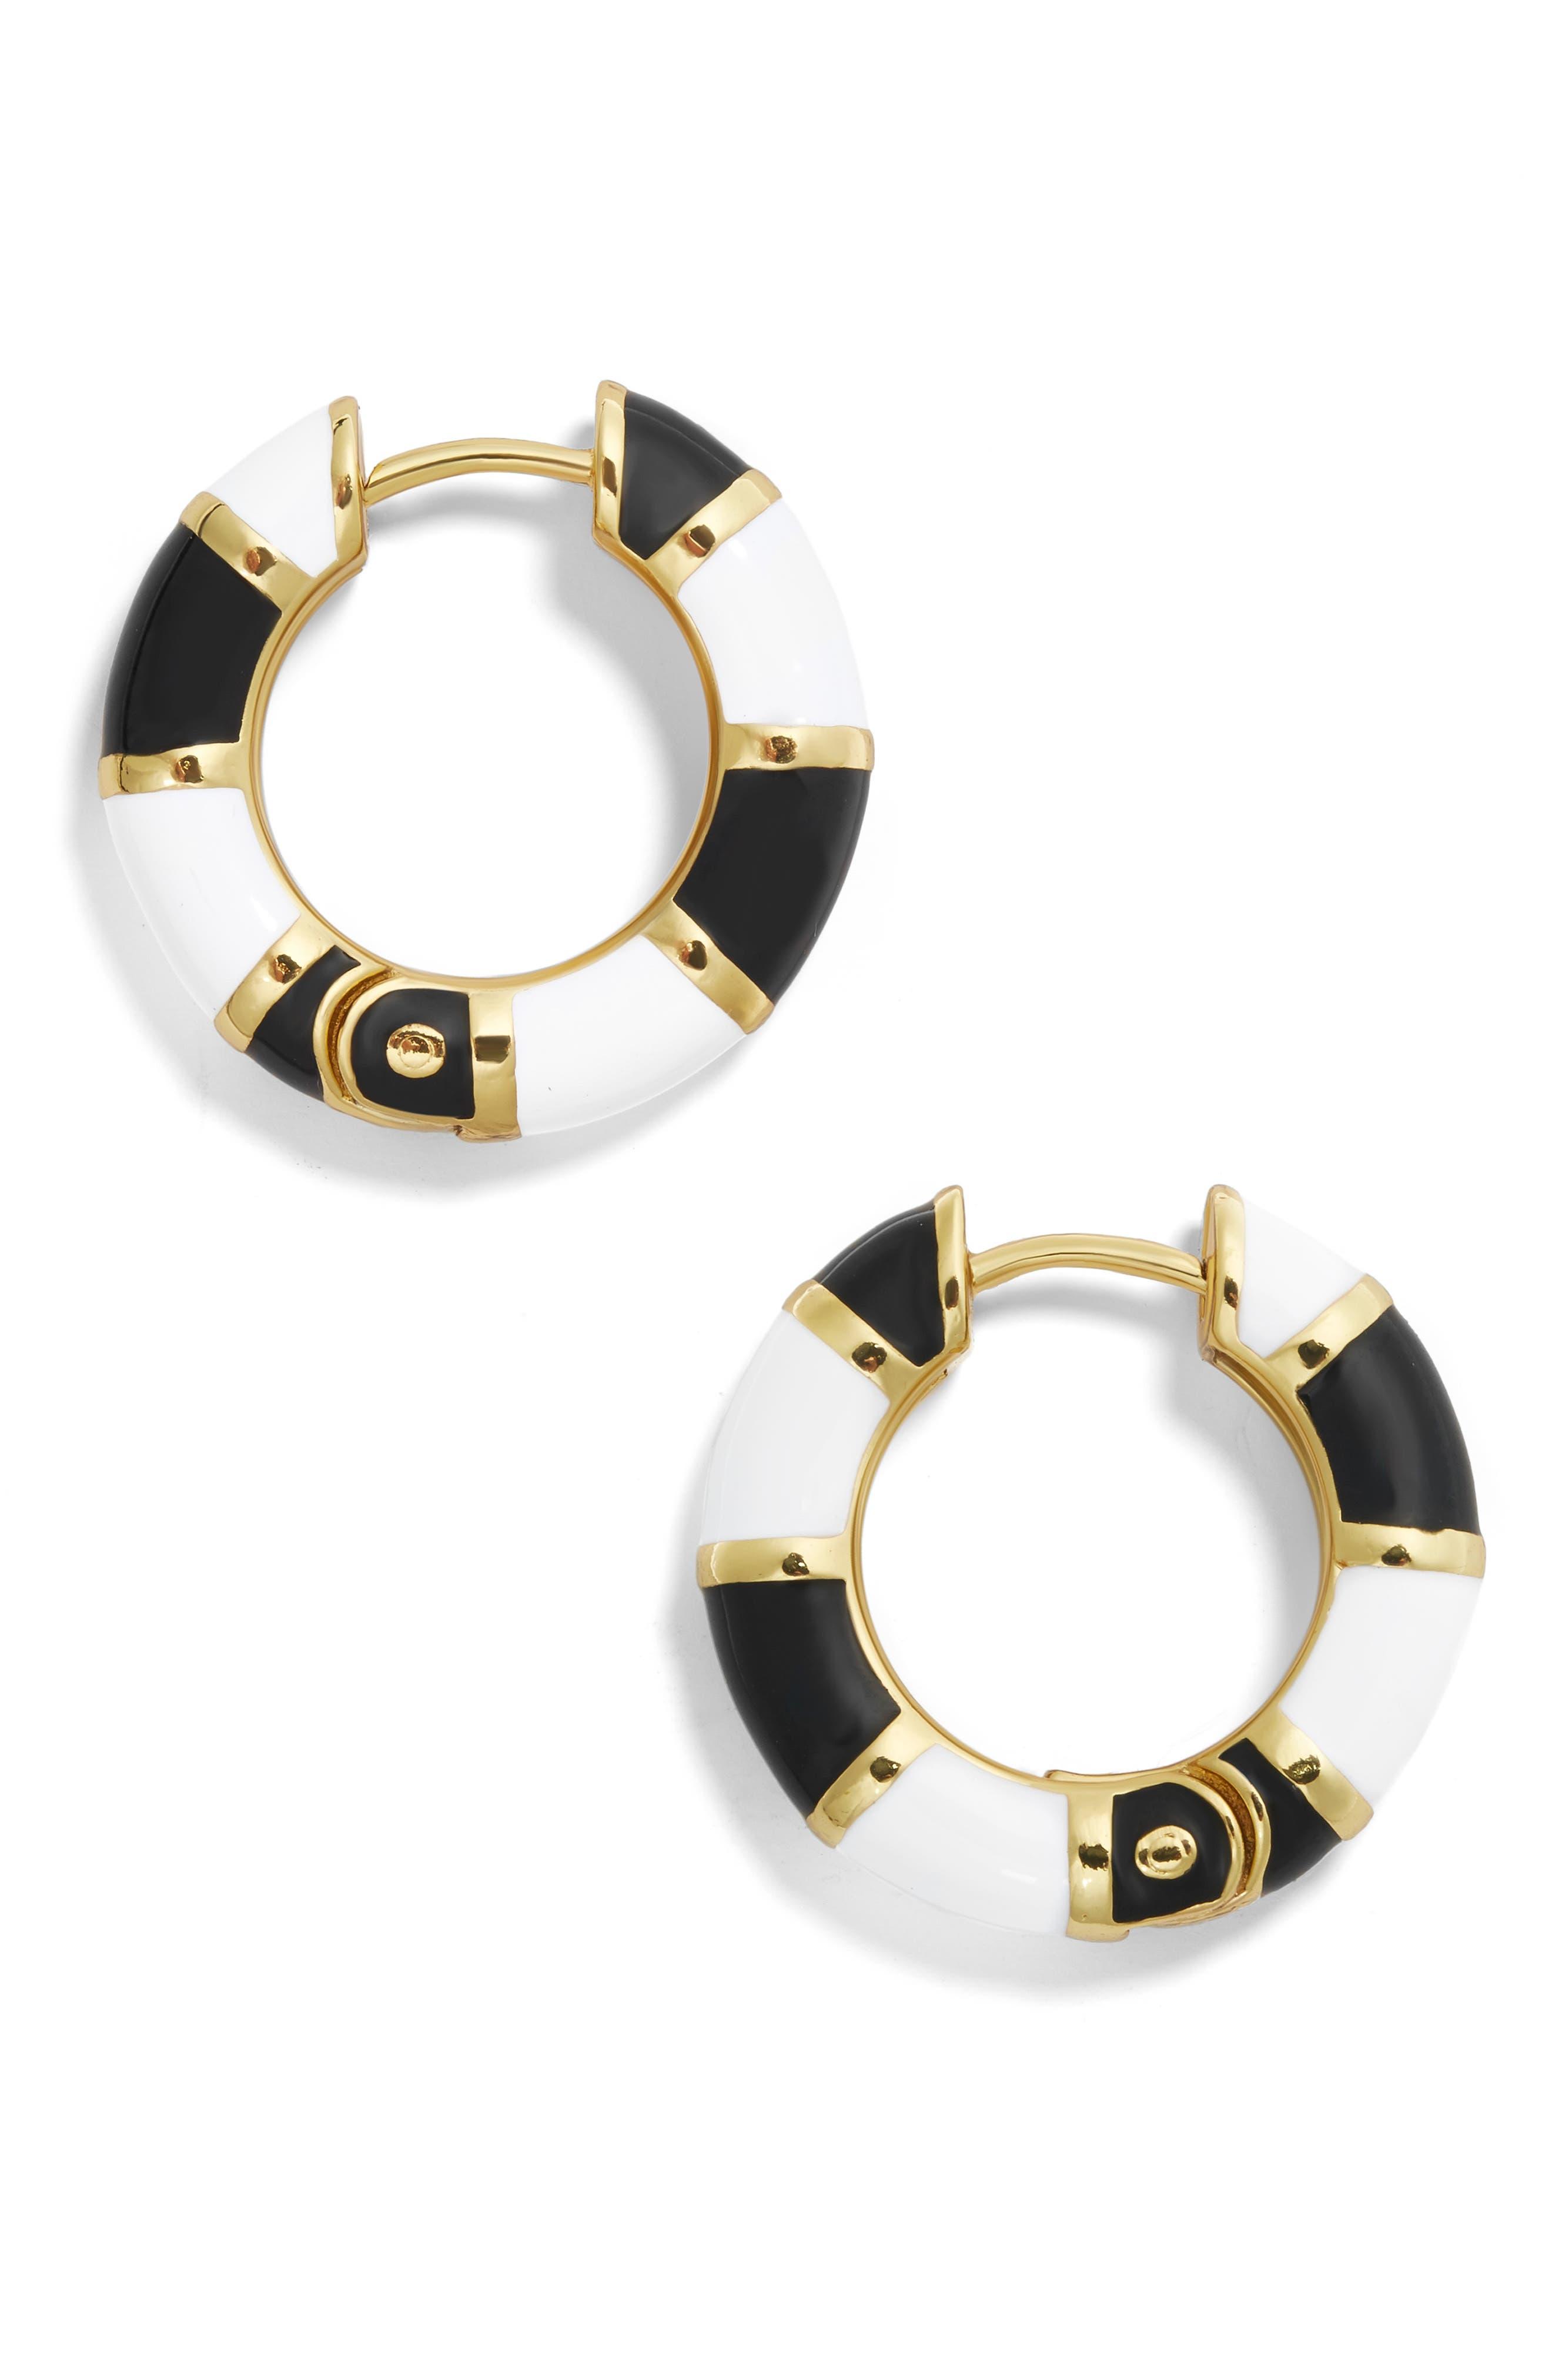 BAUBLEBAR Manila Enamel Small Hoop Earrings in Black